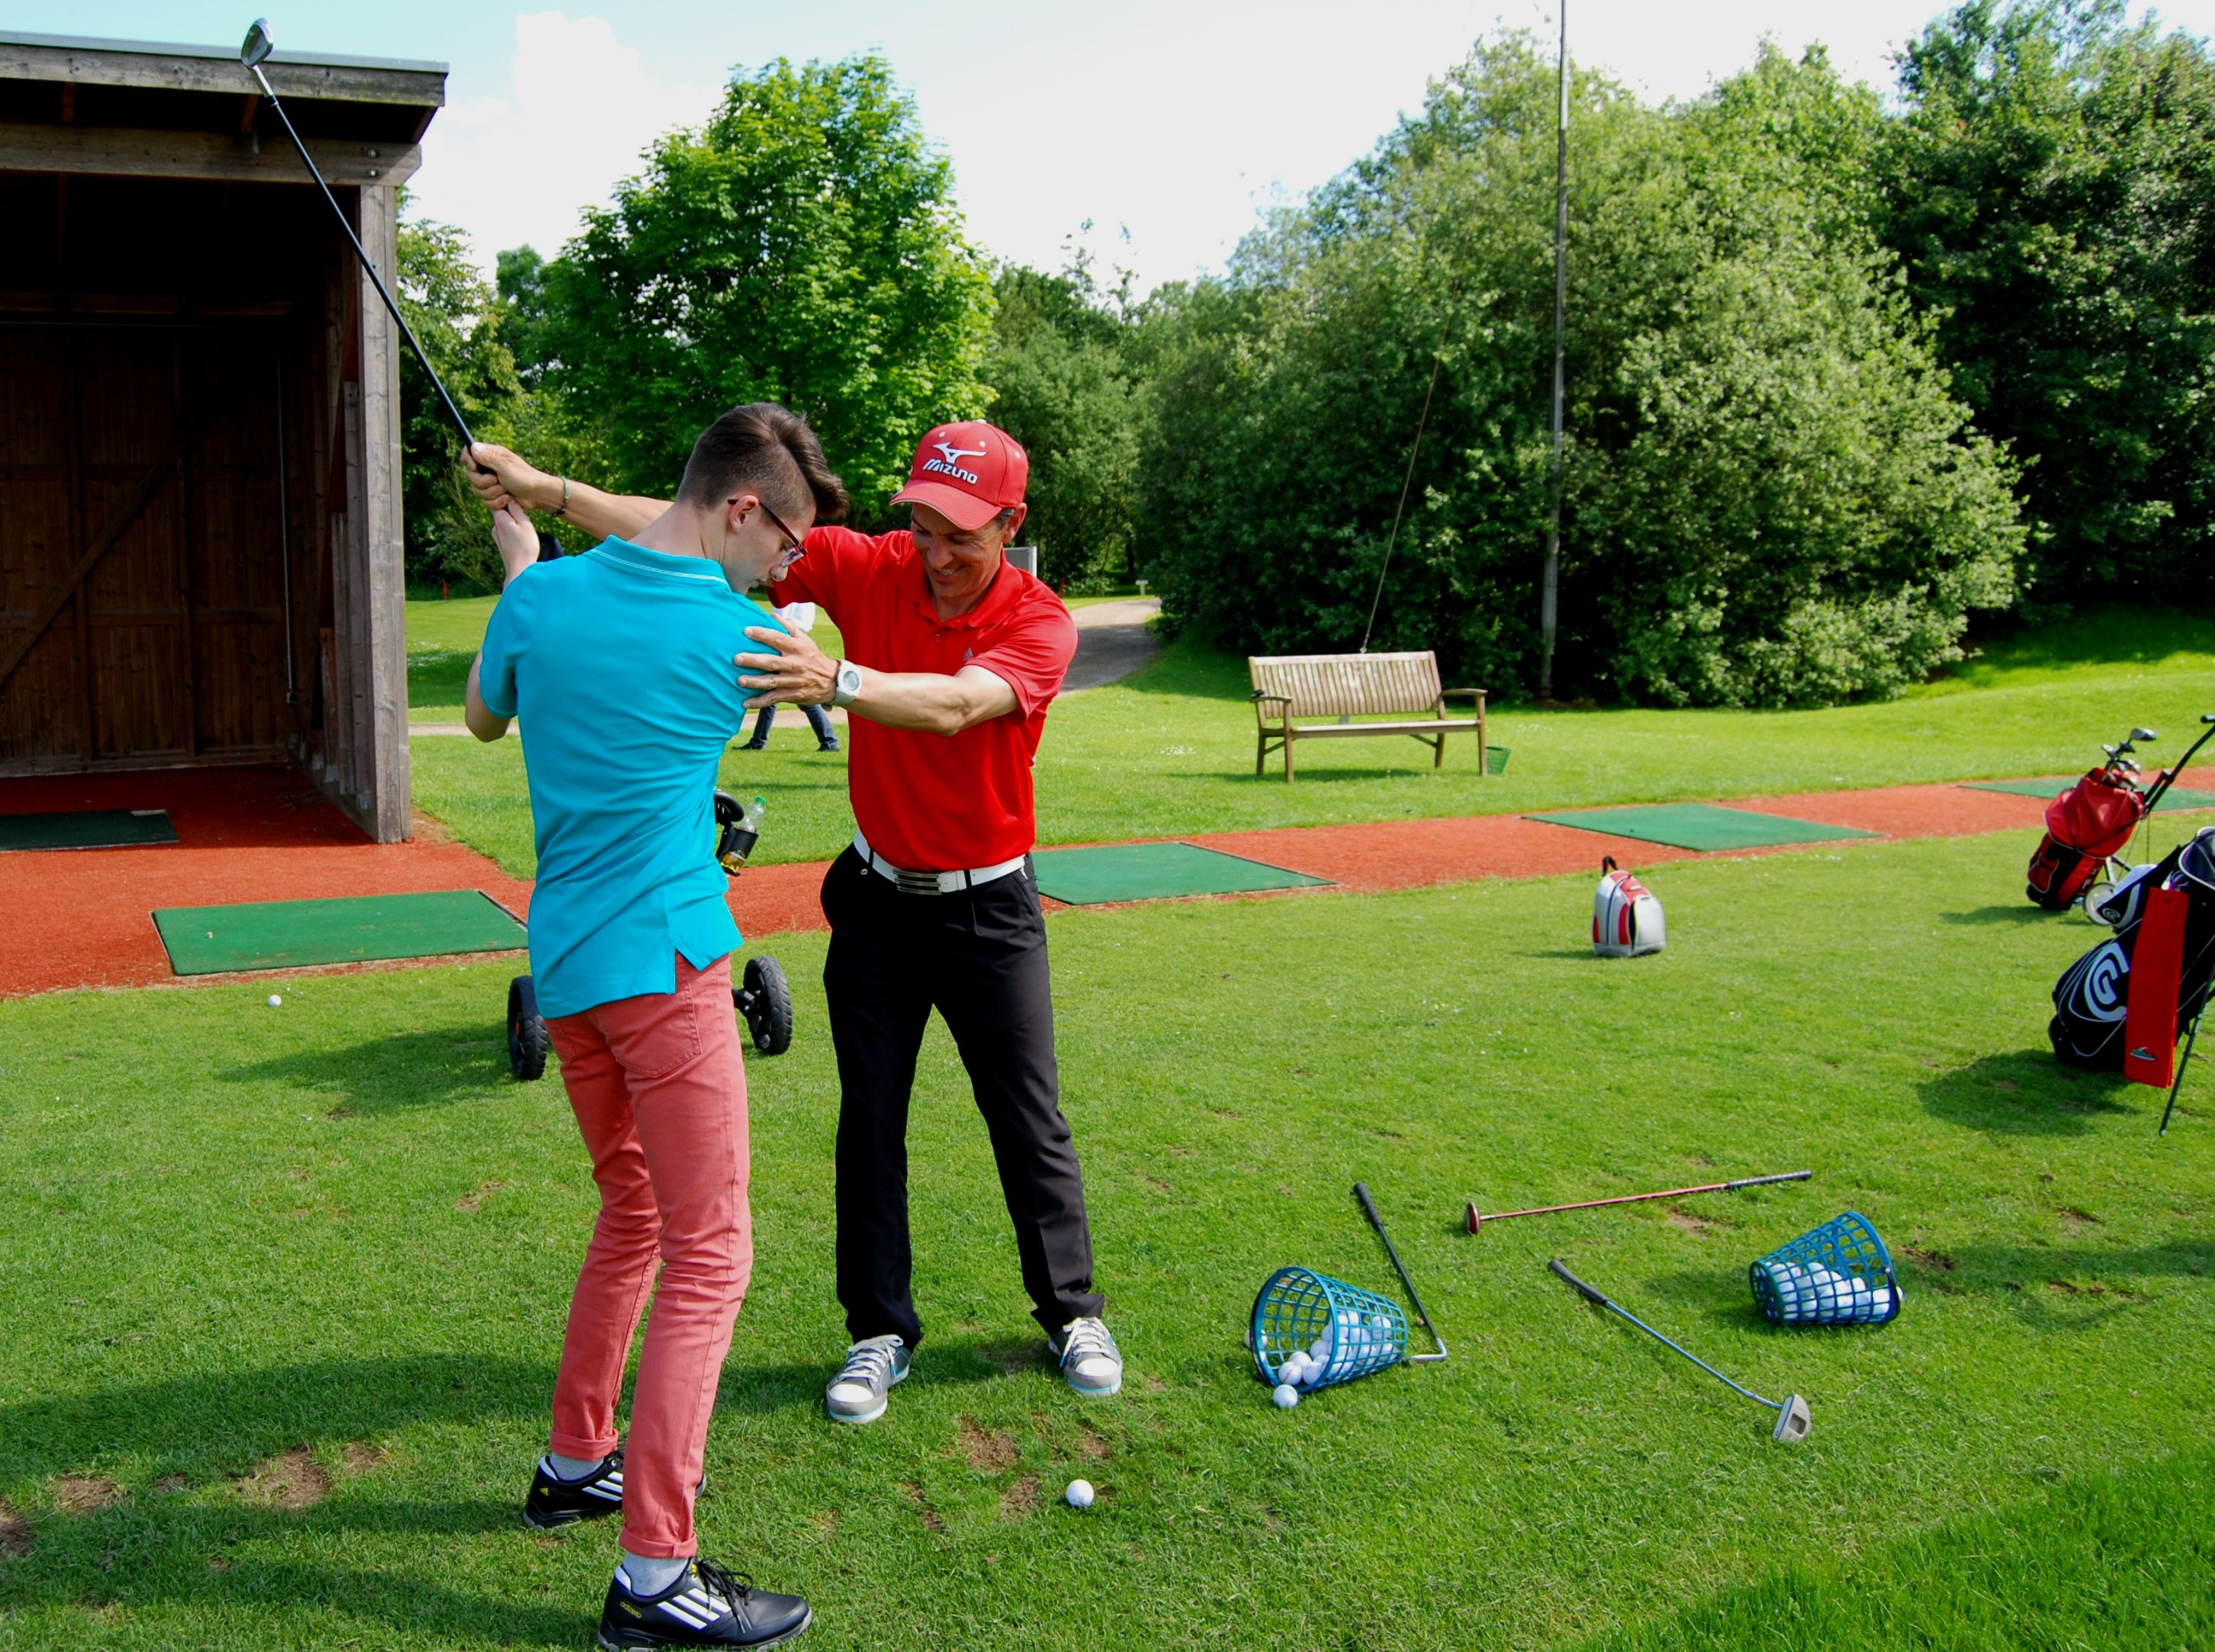 Tim Longley | Golfcoach